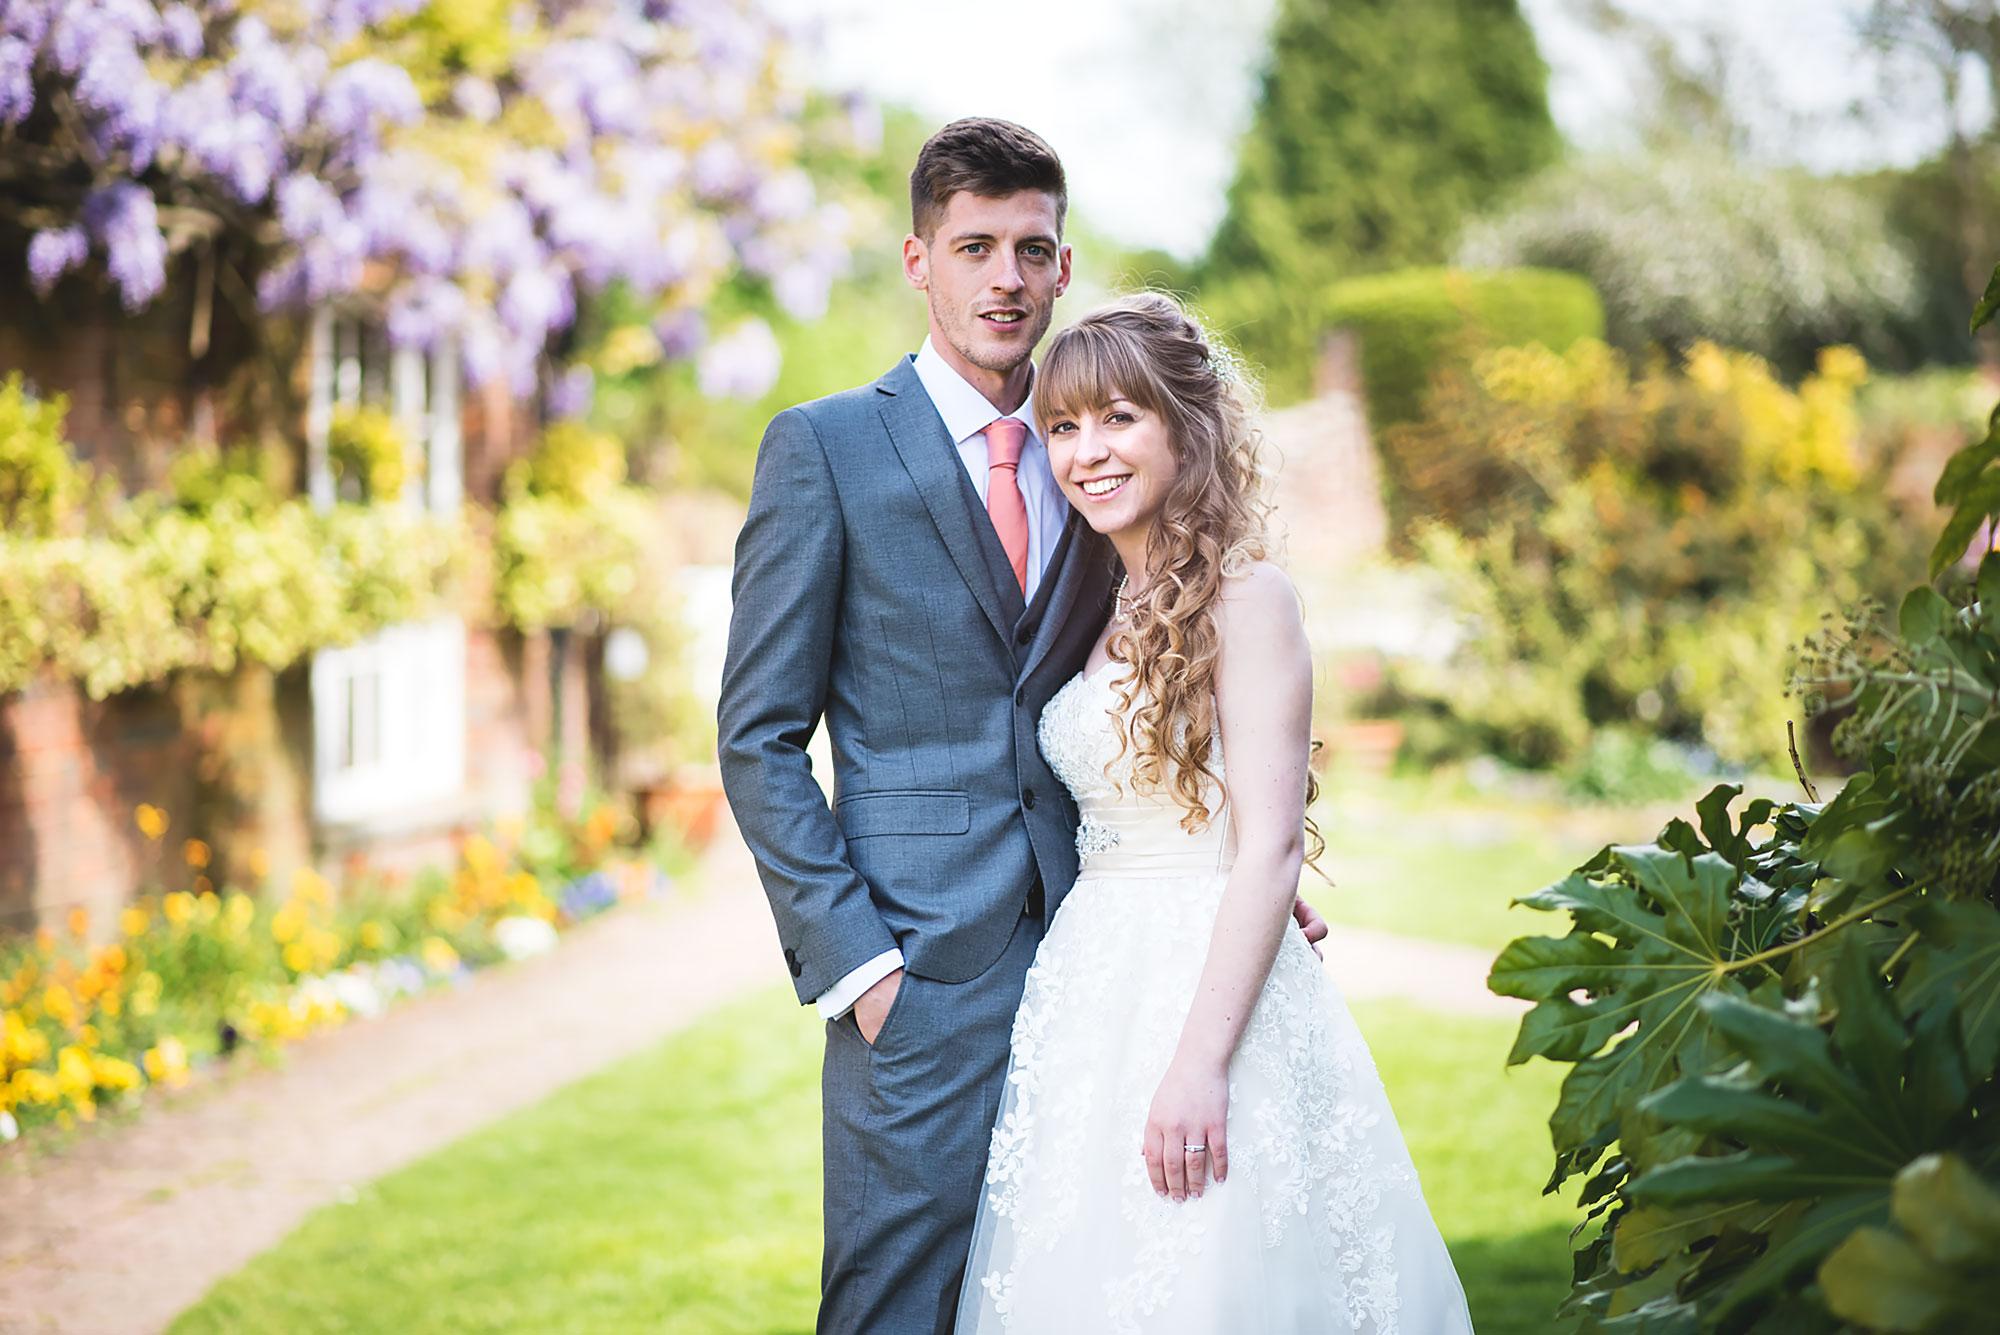 wedding photography the mill aldermaston newbury berkshire